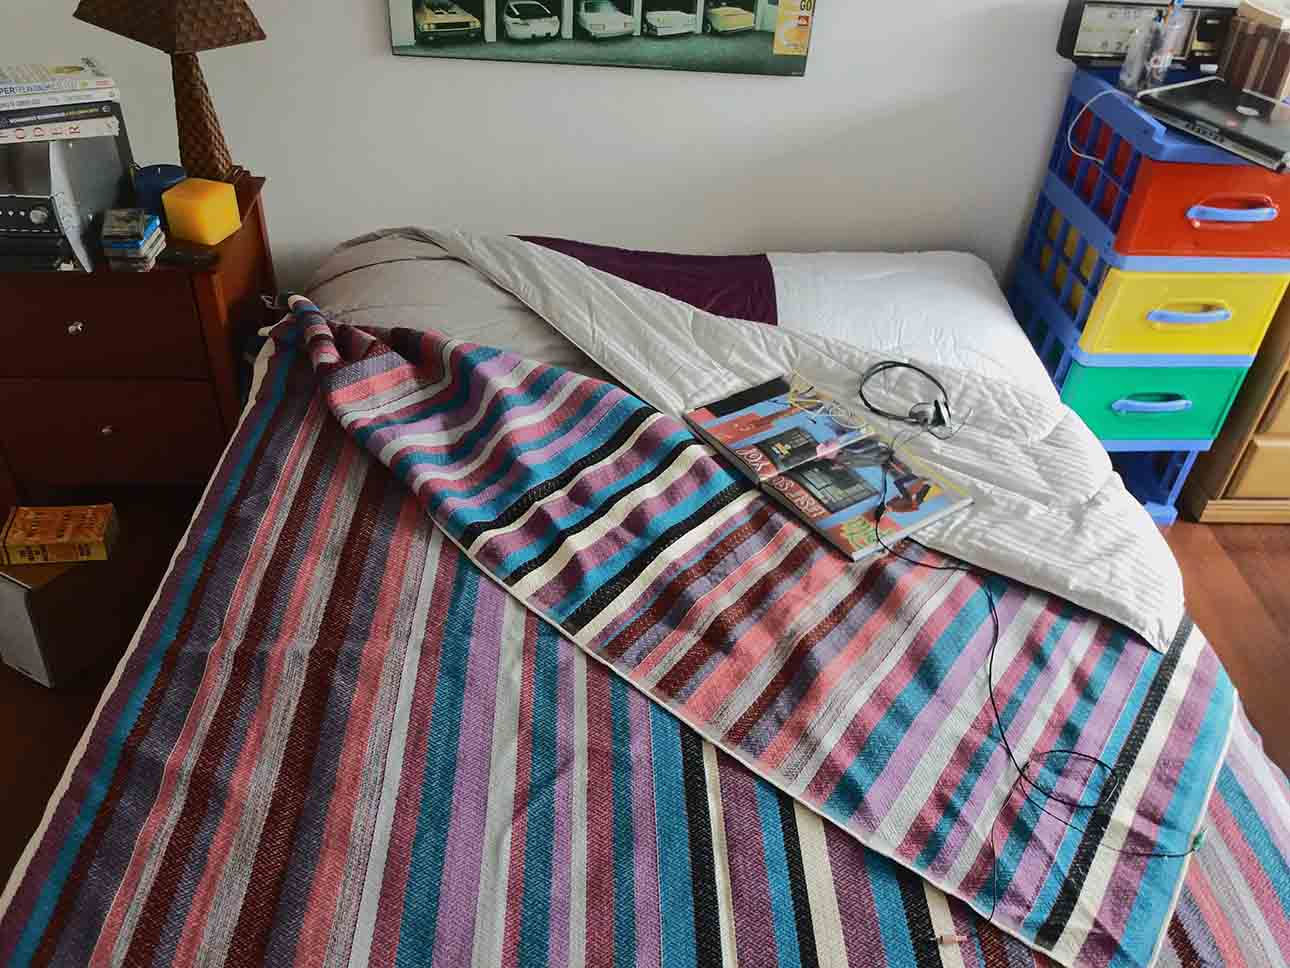 20190527 135203 ALPACA bed blanket AMZN333 sd222